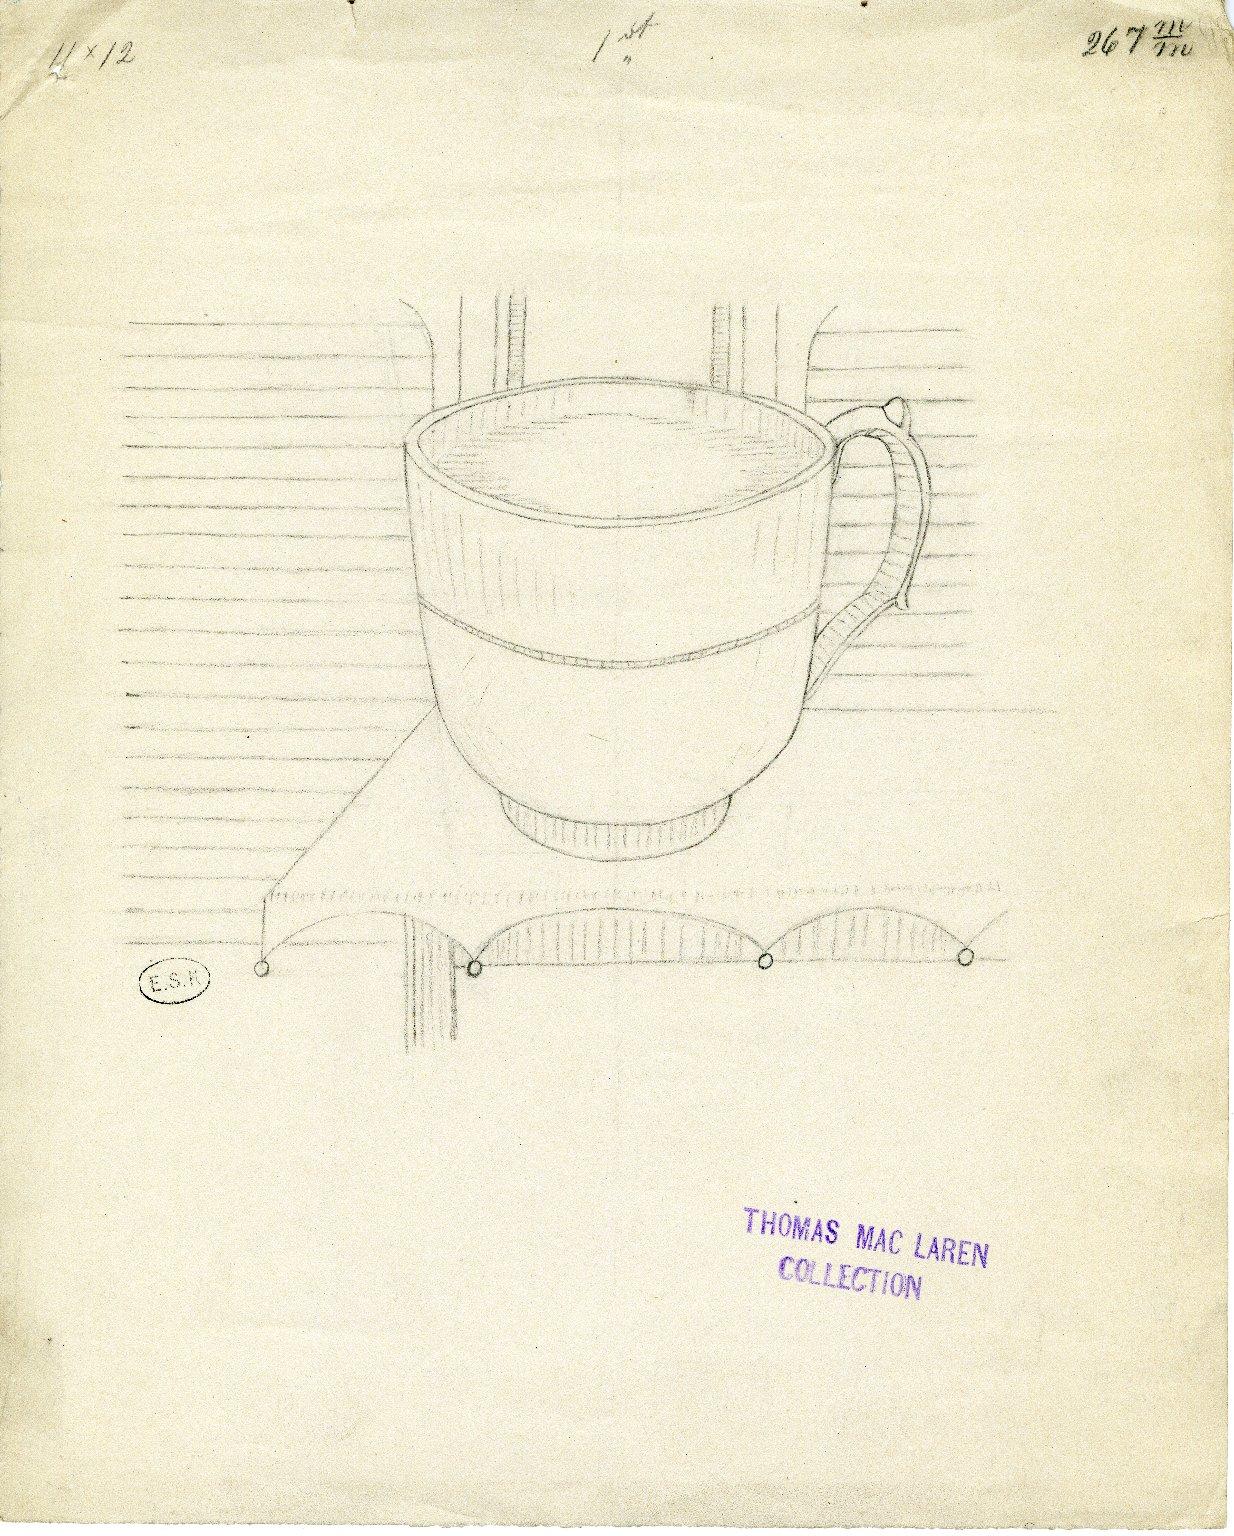 Filled teacup on corner of table